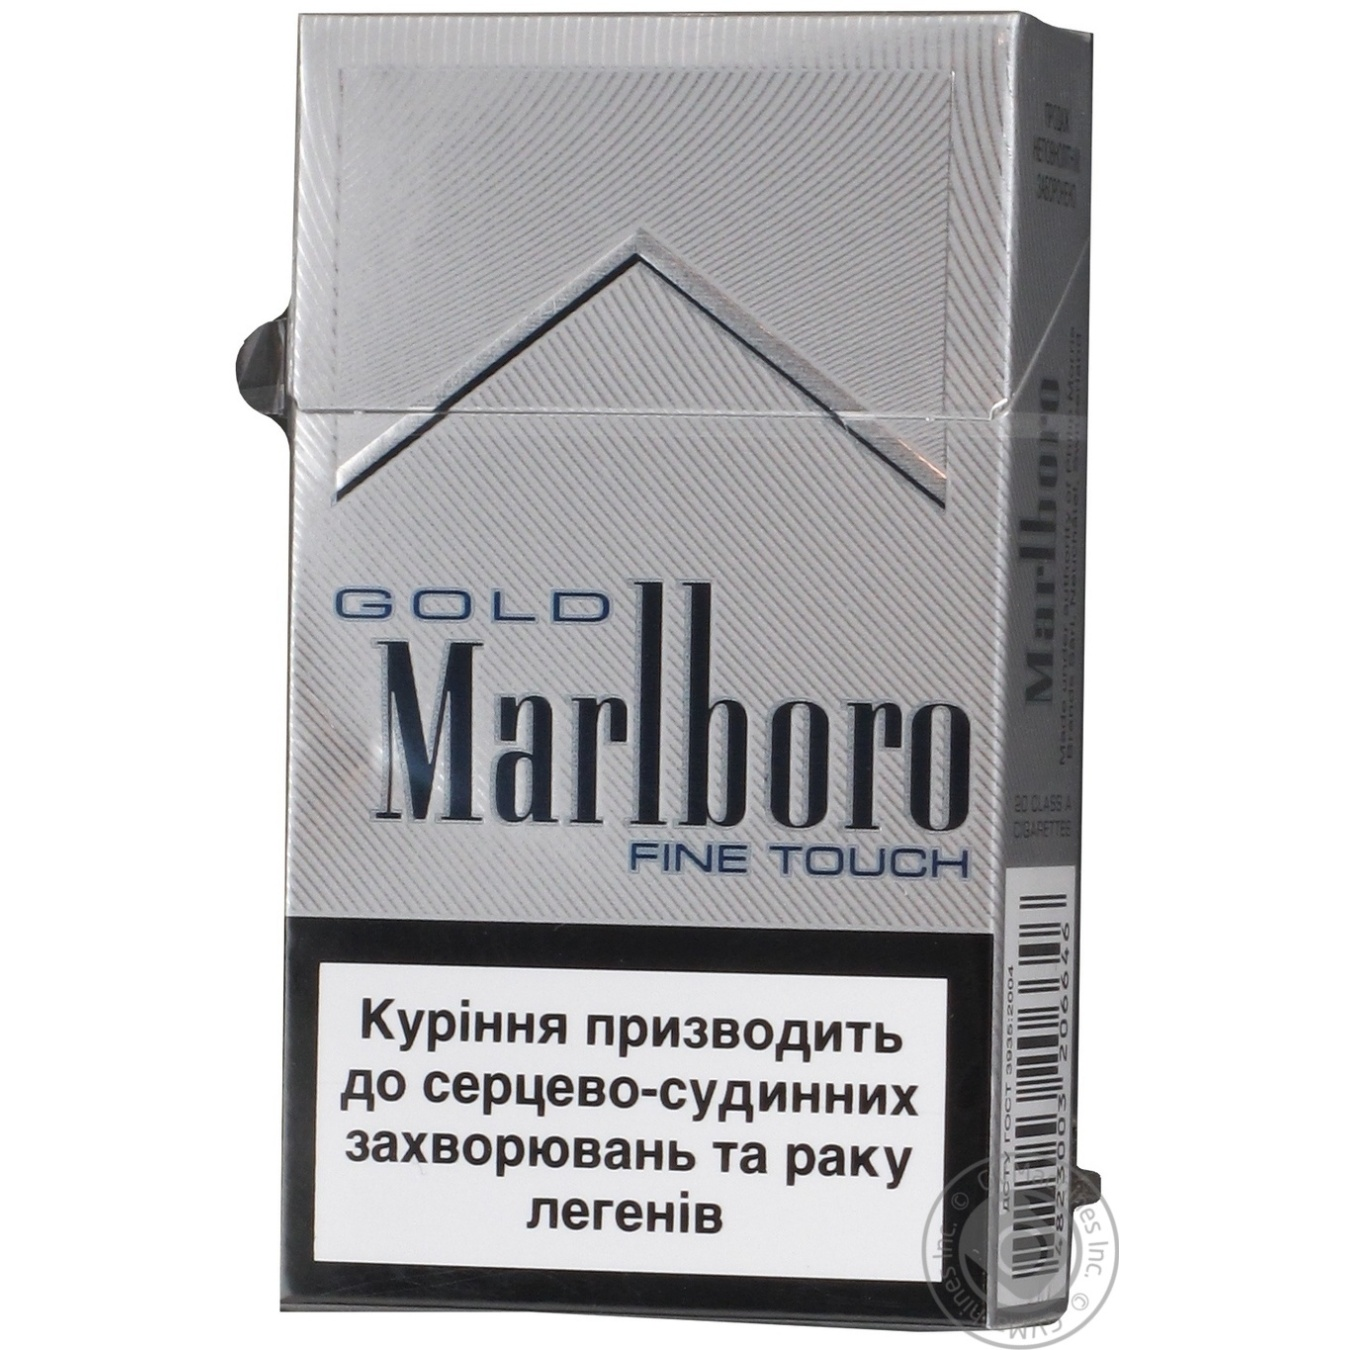 Cigarettes Marlboro 25g Switzerland Tobacco Goods Black 20